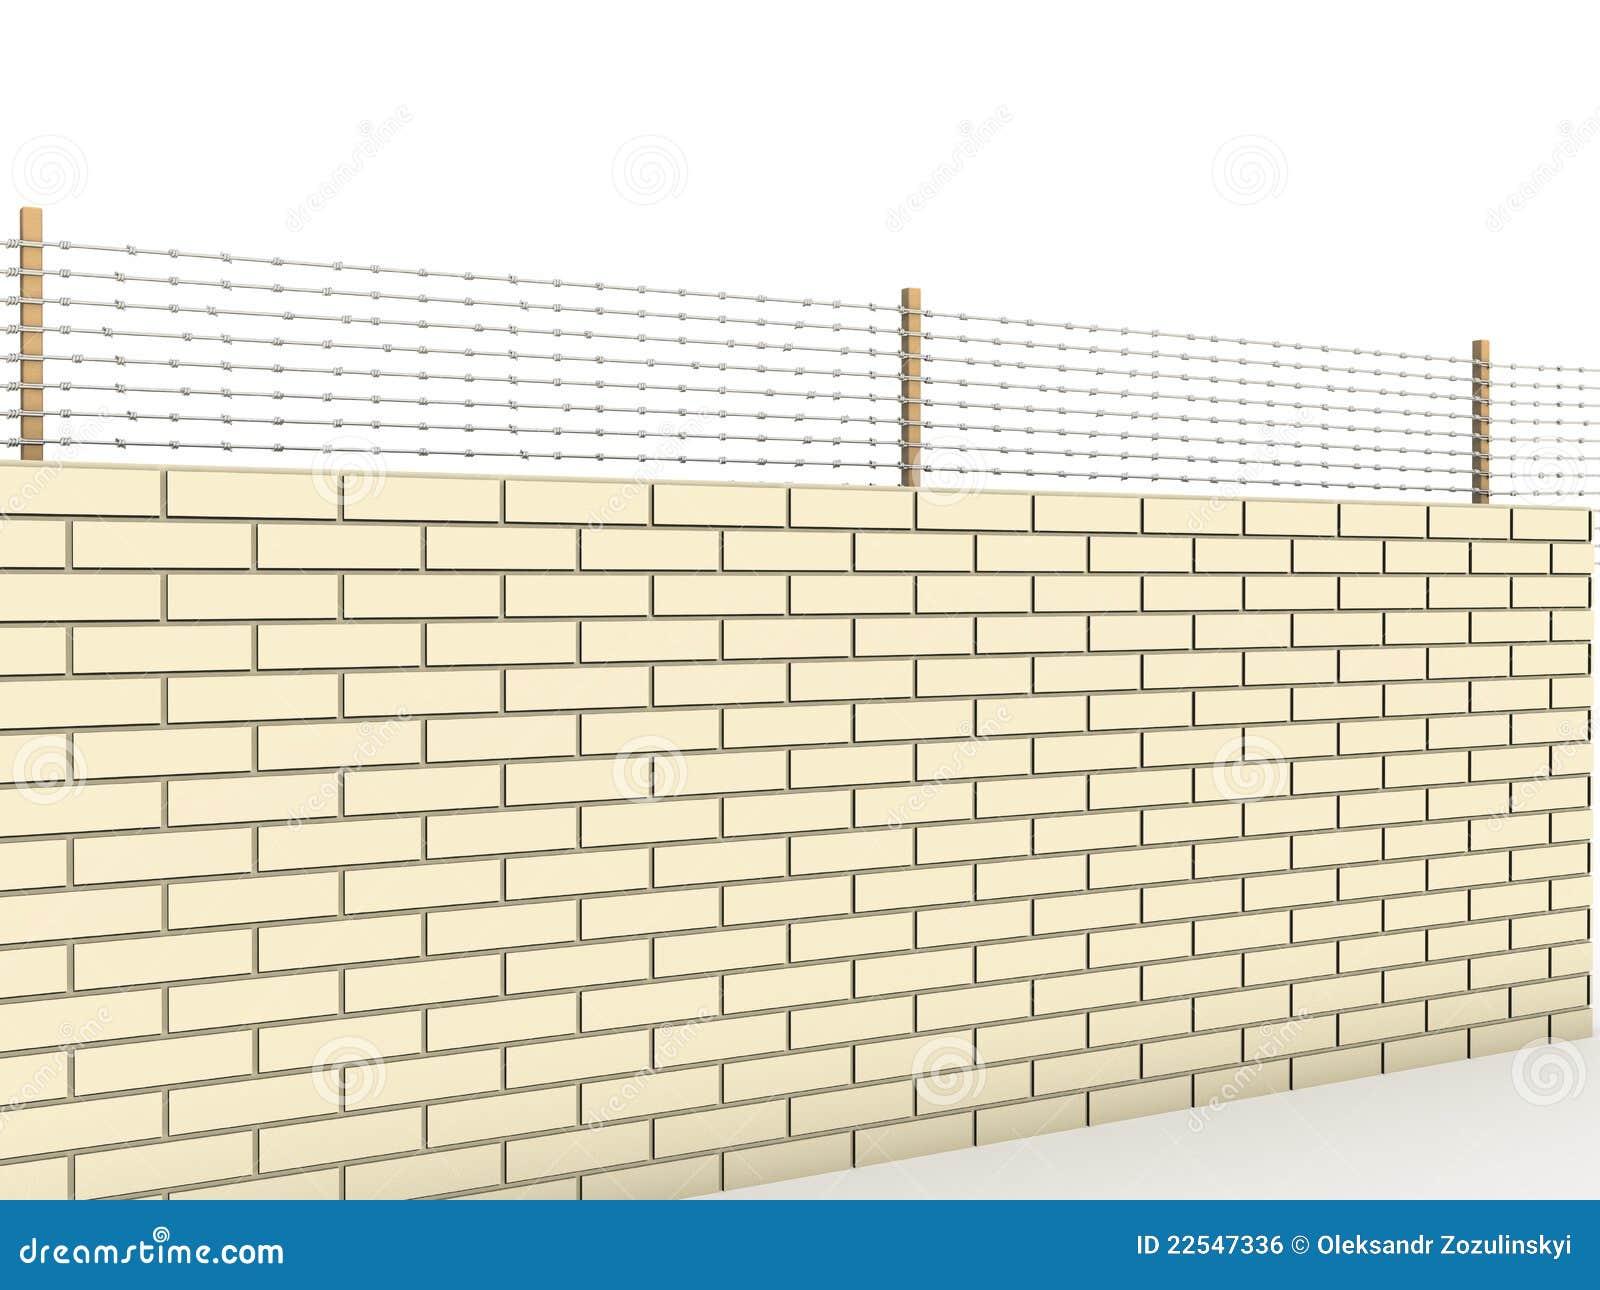 mur de briques blanc compl t avec le barbel 1 image libre de droits image 22547336. Black Bedroom Furniture Sets. Home Design Ideas